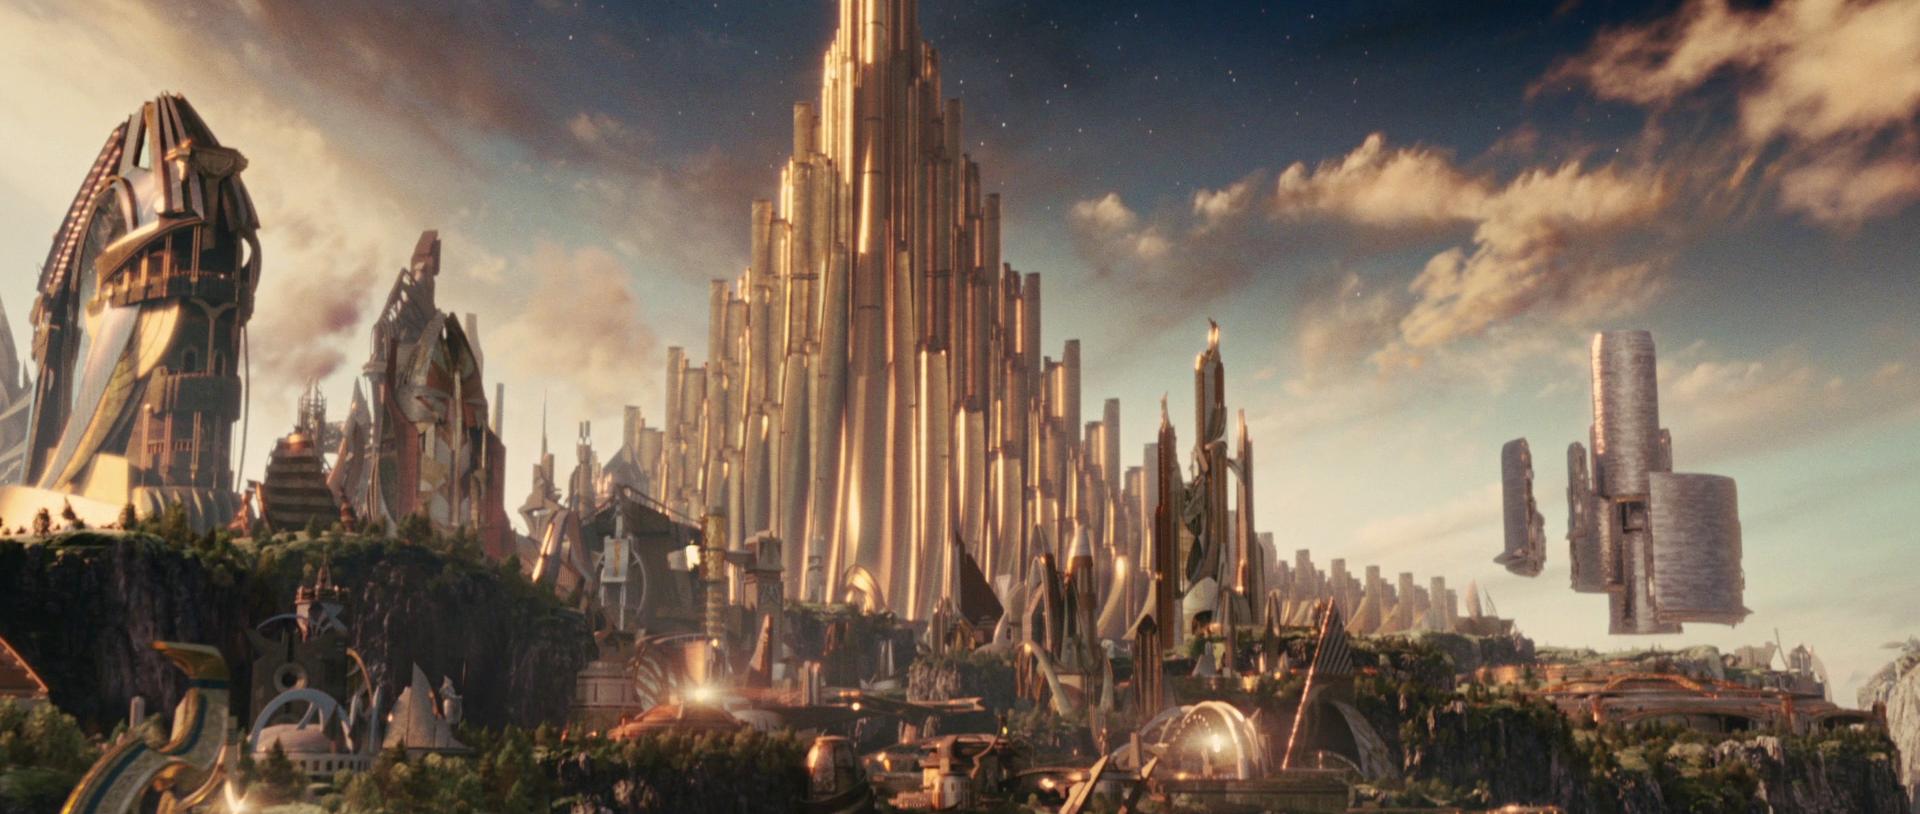 Avengers 4 Directors Asgardians Thanos Snap